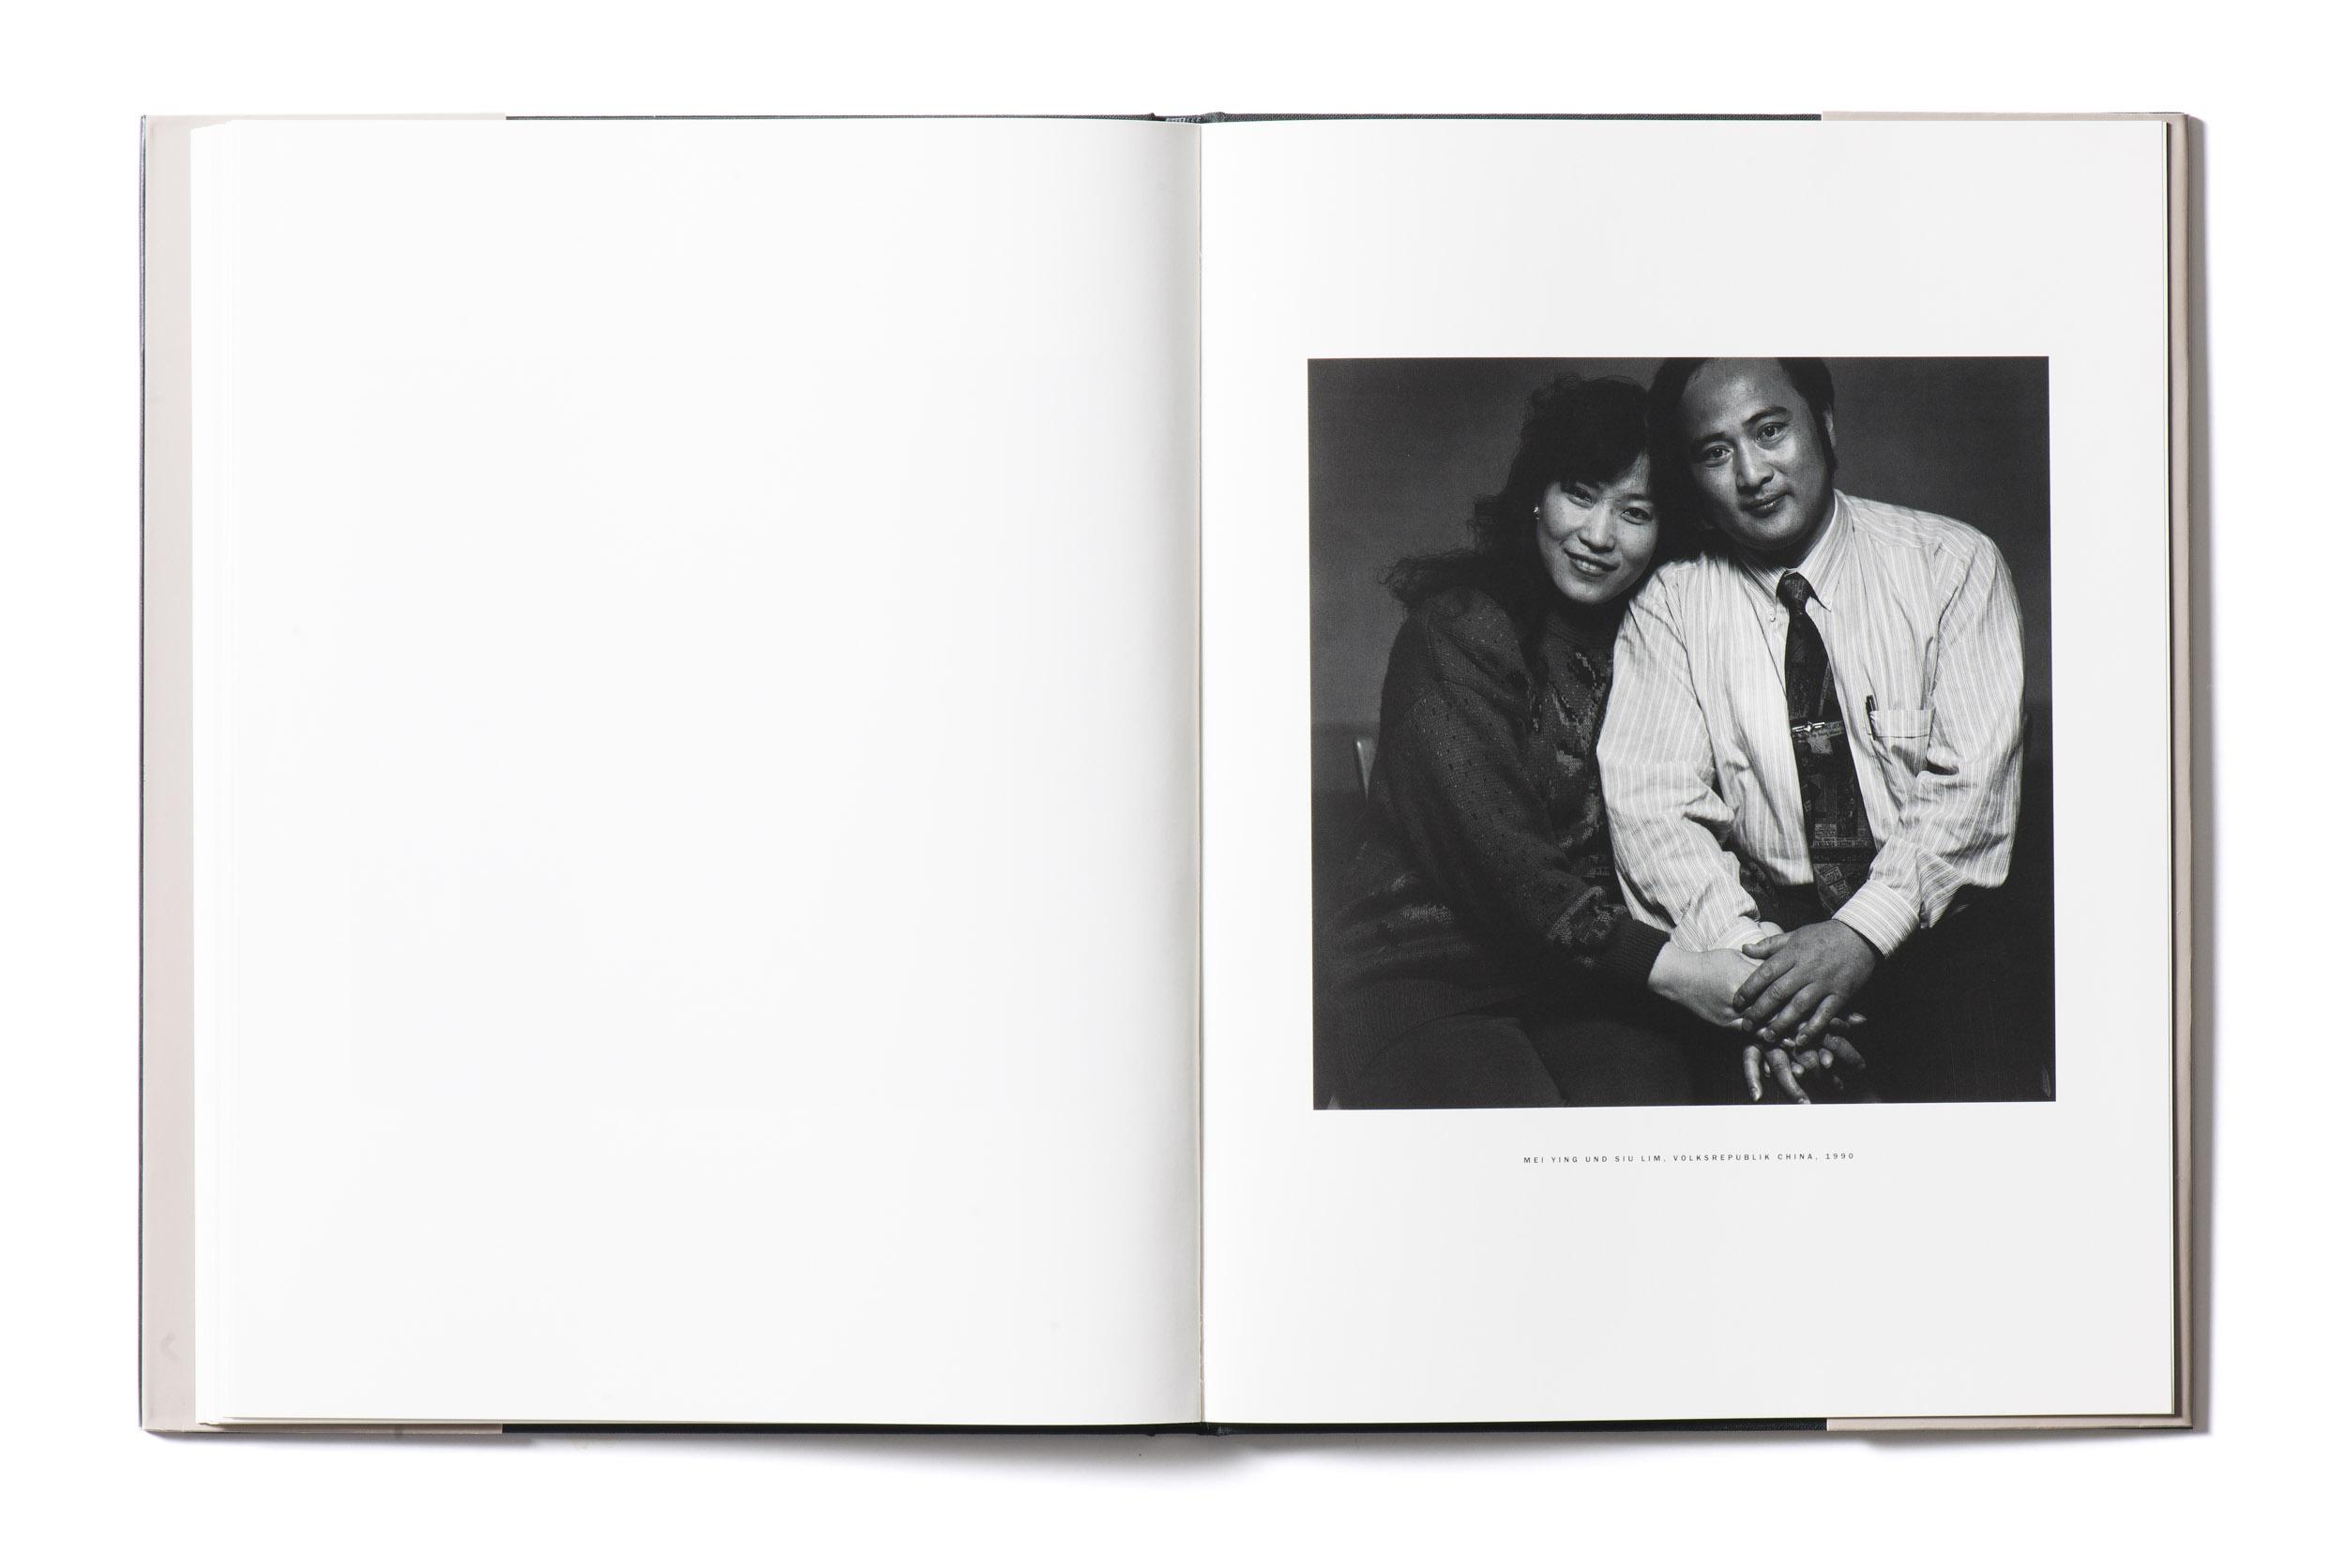 Kunstband Fotografien Peter Hebeisen Titel Feindbilder #10